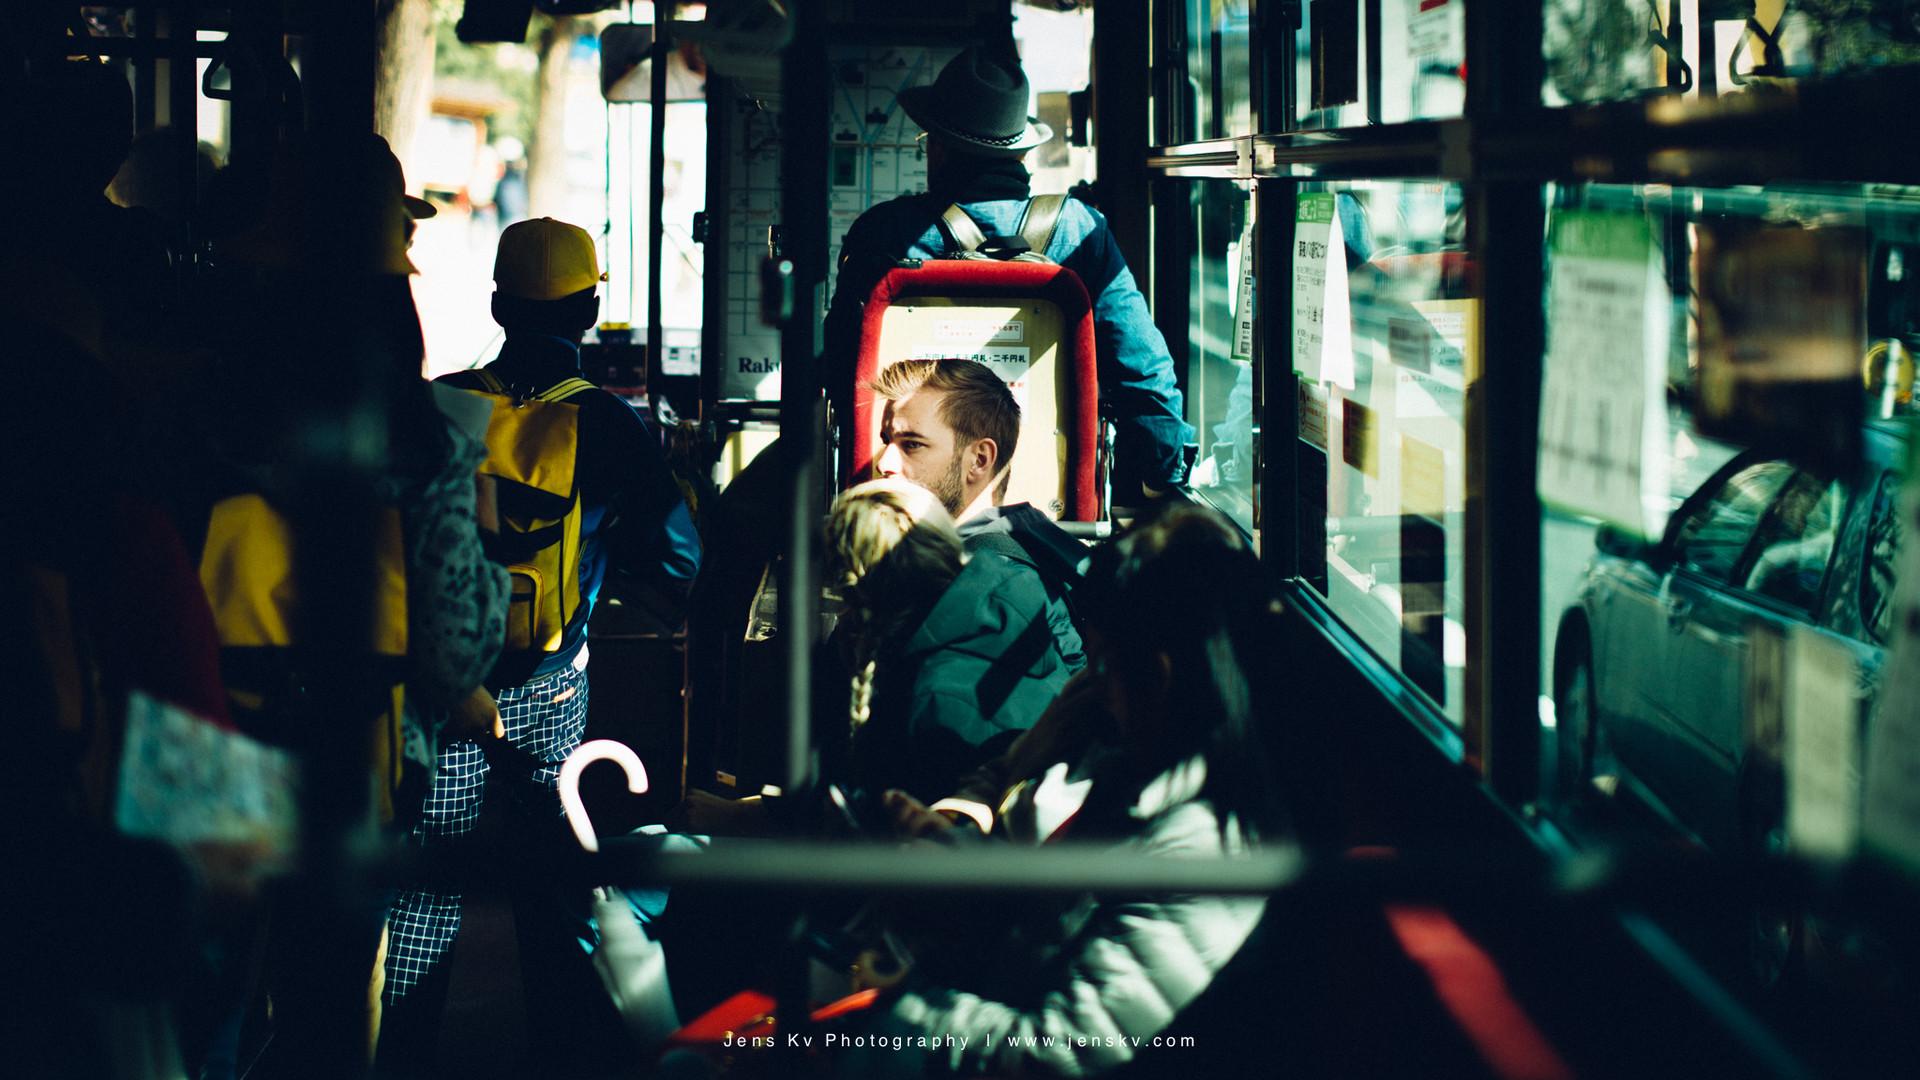 Kyoto, Travel, Trip, Japan, Portrait, Purple, Street, Bus, Sunlight